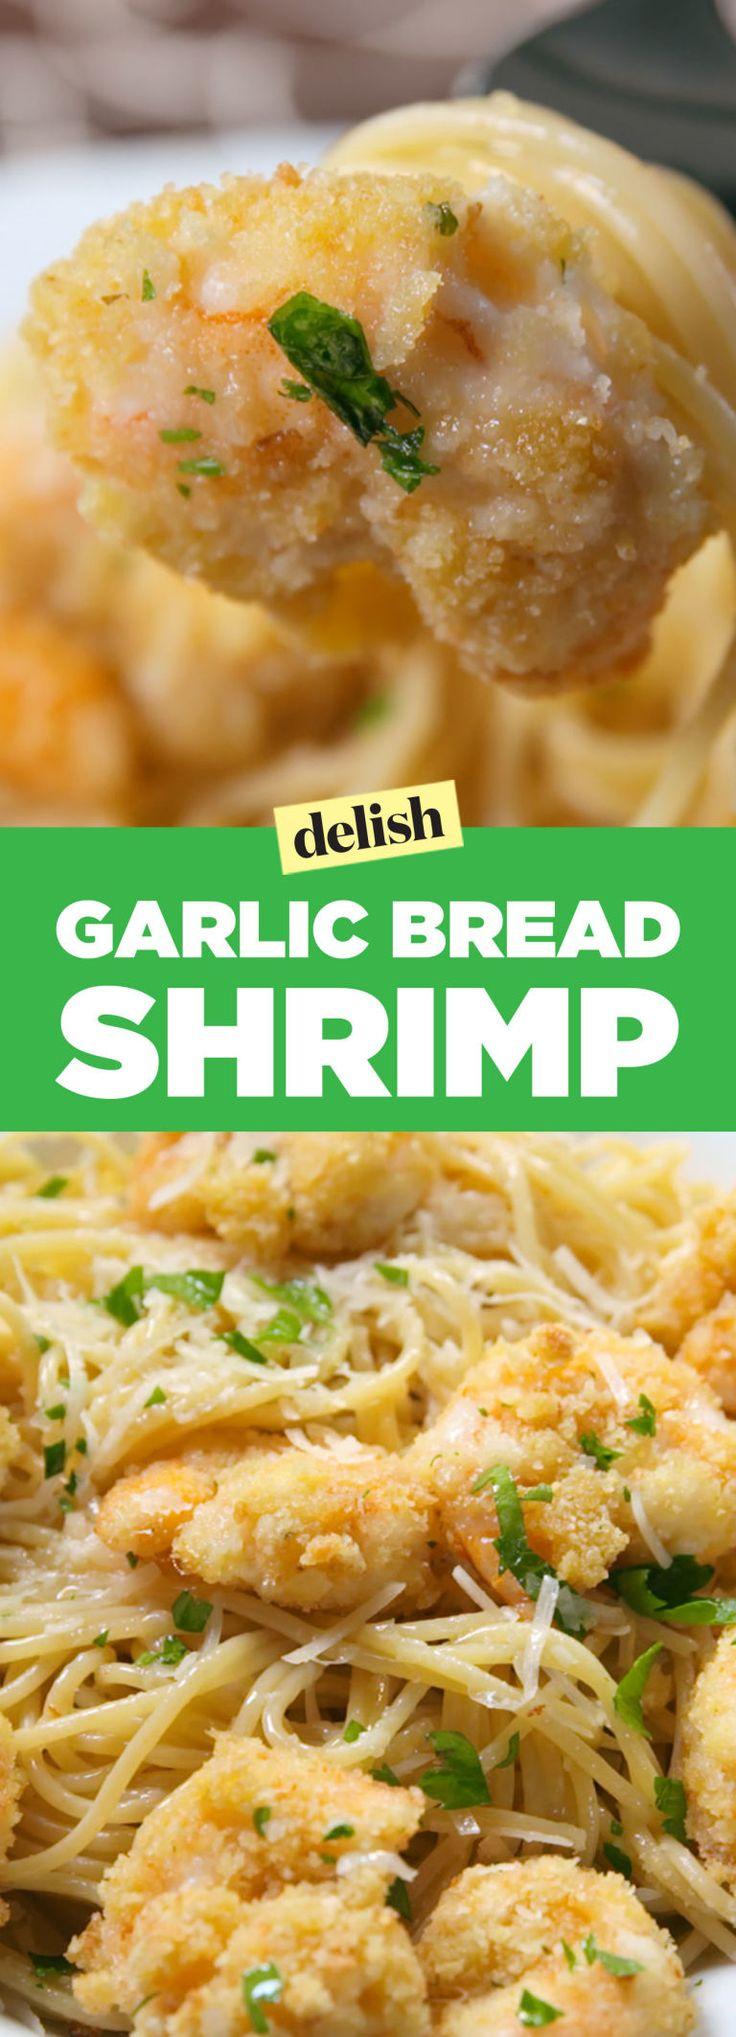 Garlic bread shrimp uses the most amazing frozen garlic bread hack. Try it ASAP! Get the recipe on Delish.com.